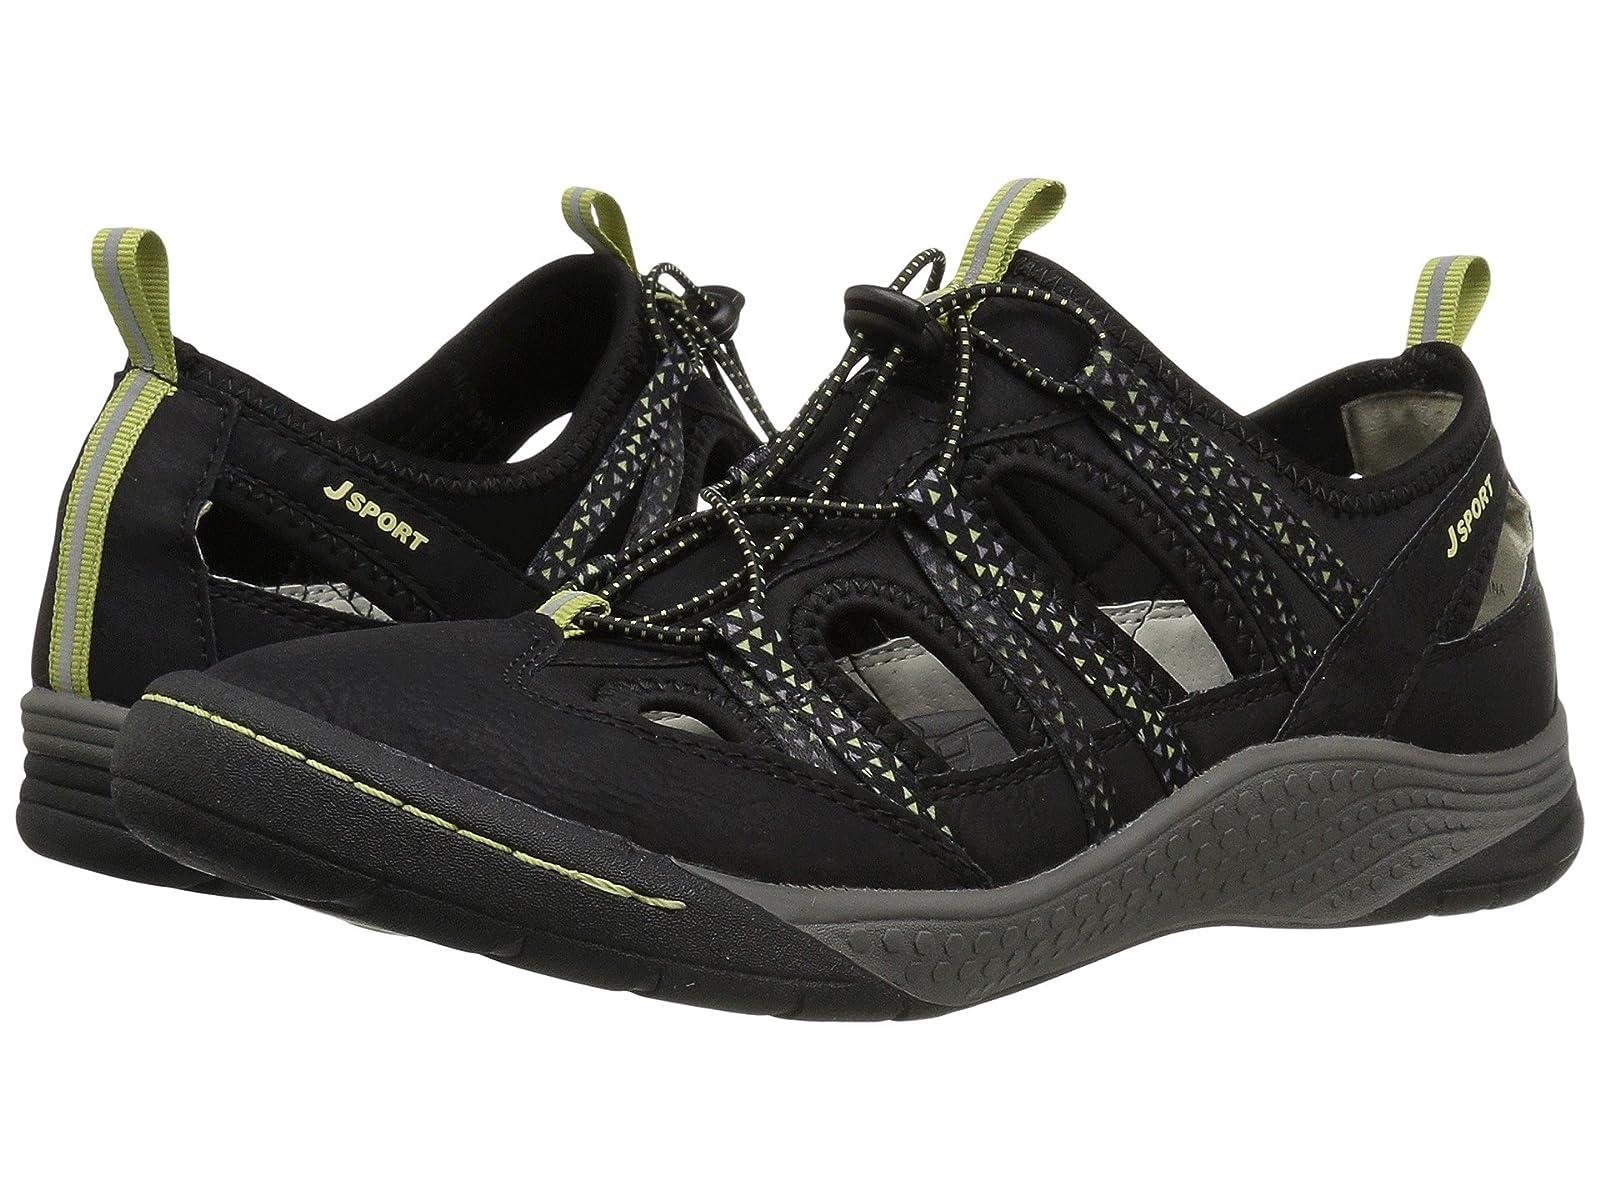 JBU HibiscusCheap and distinctive eye-catching shoes